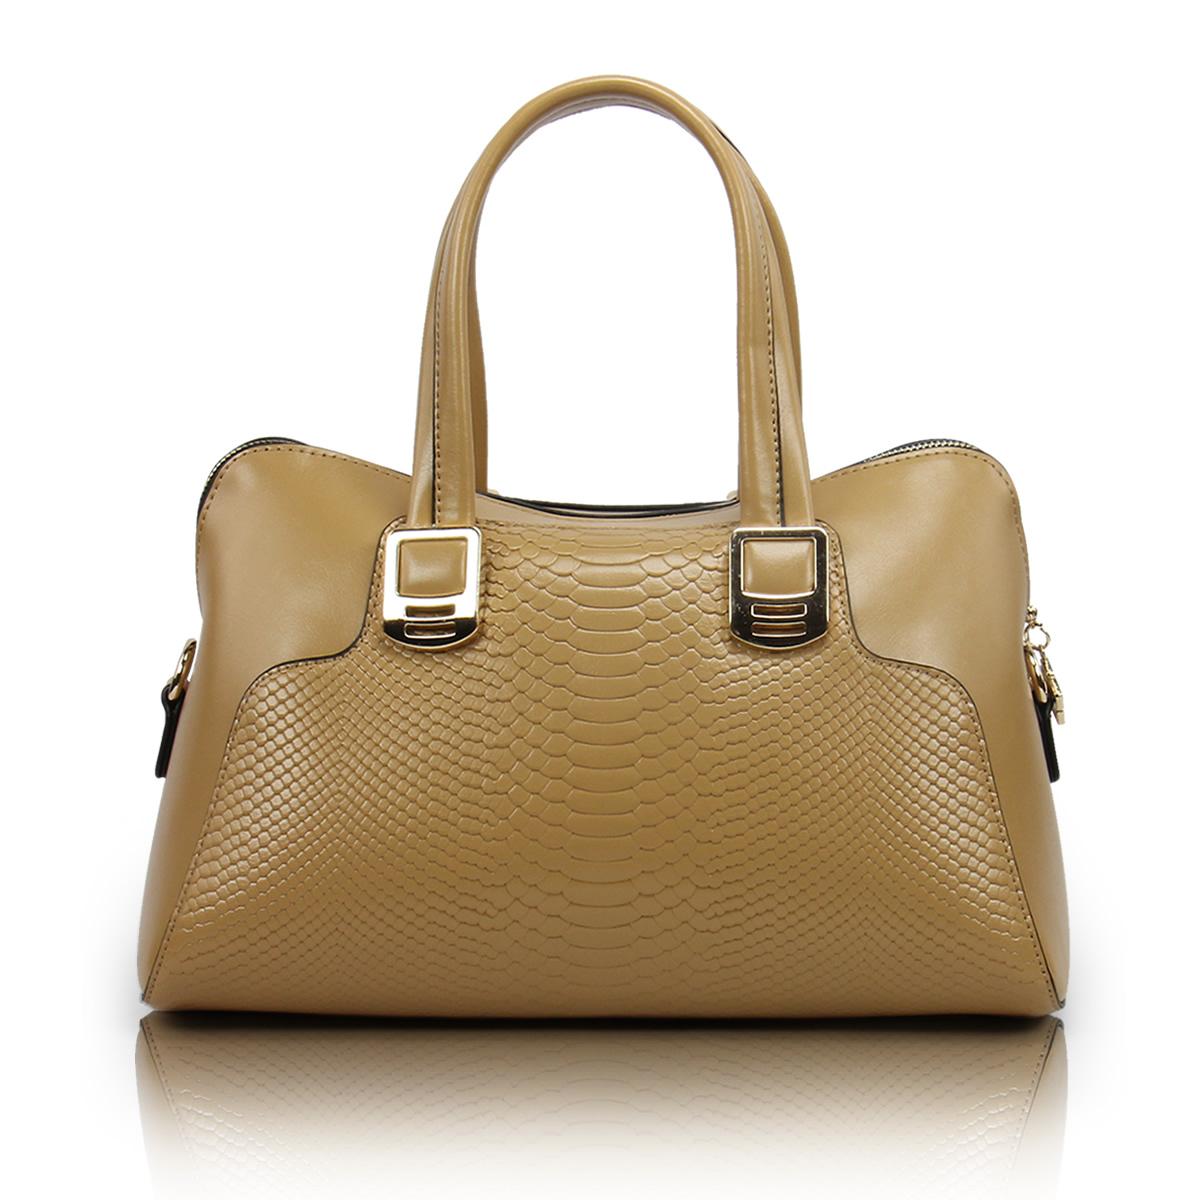 2012 women's handbag fashion women's handbag bag city life women's handbag(China (Mainland))